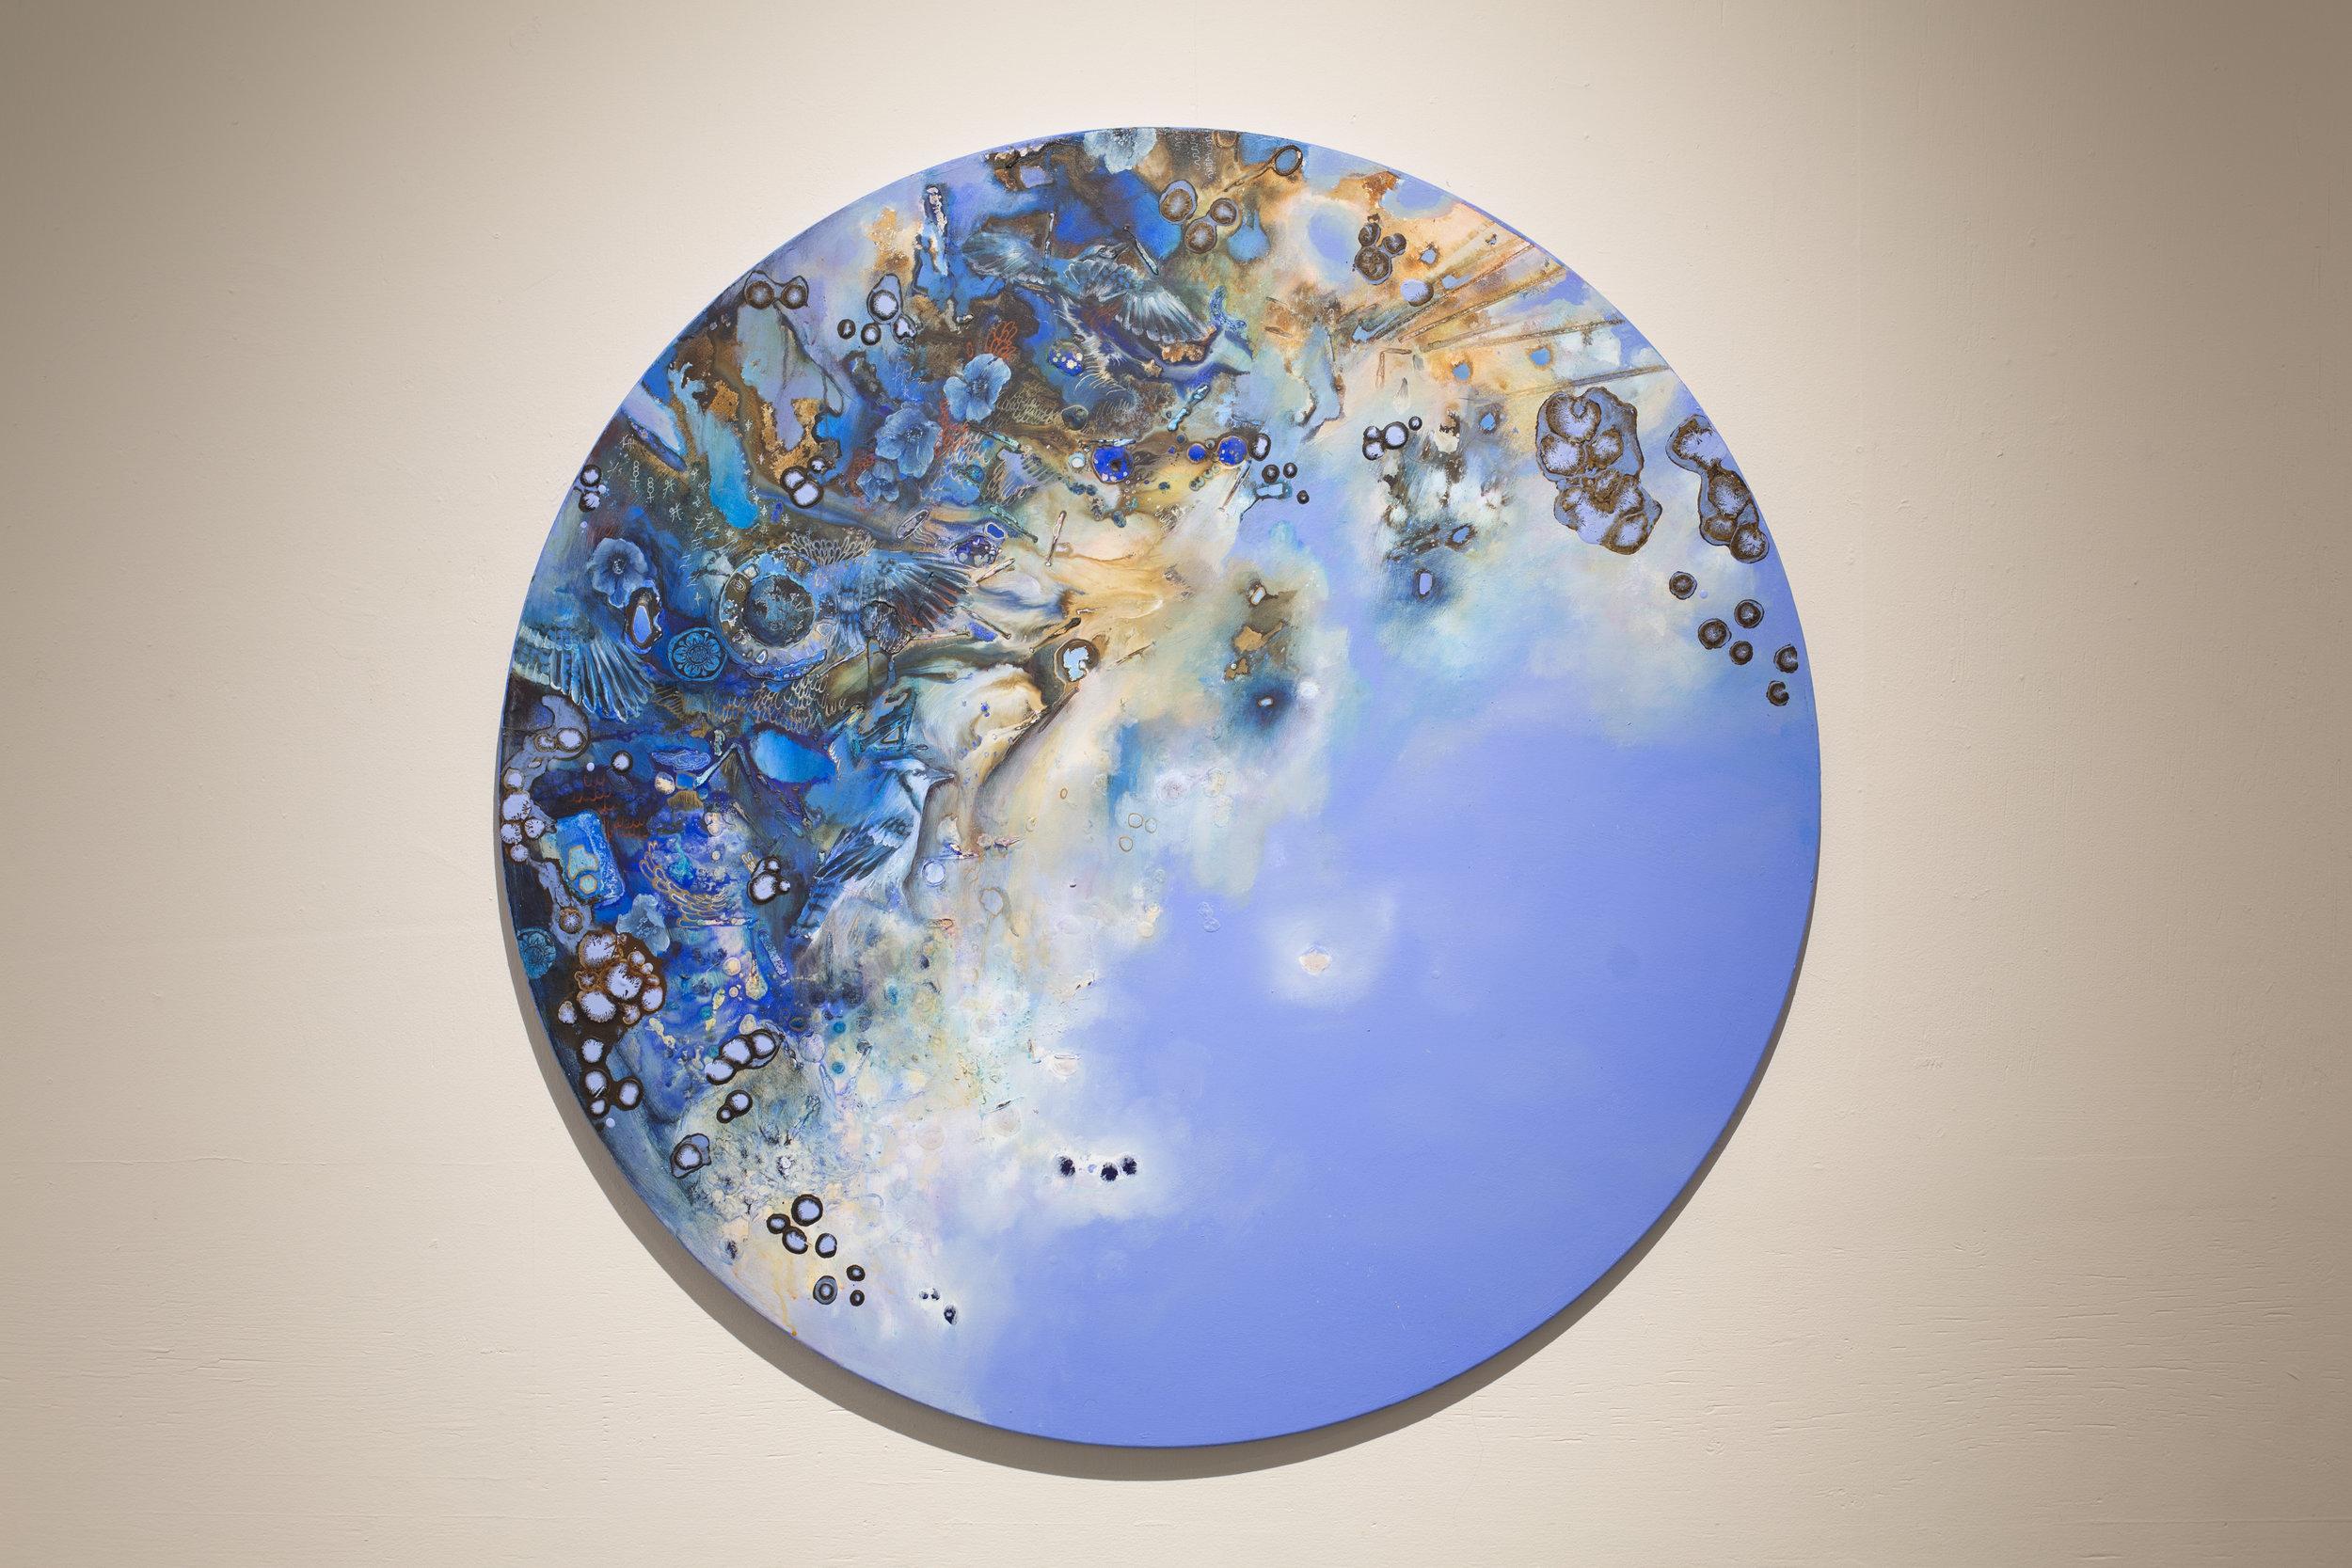 "Jay, Acrylic on Canvas, 47"" Diameter, 2018. SOLD"